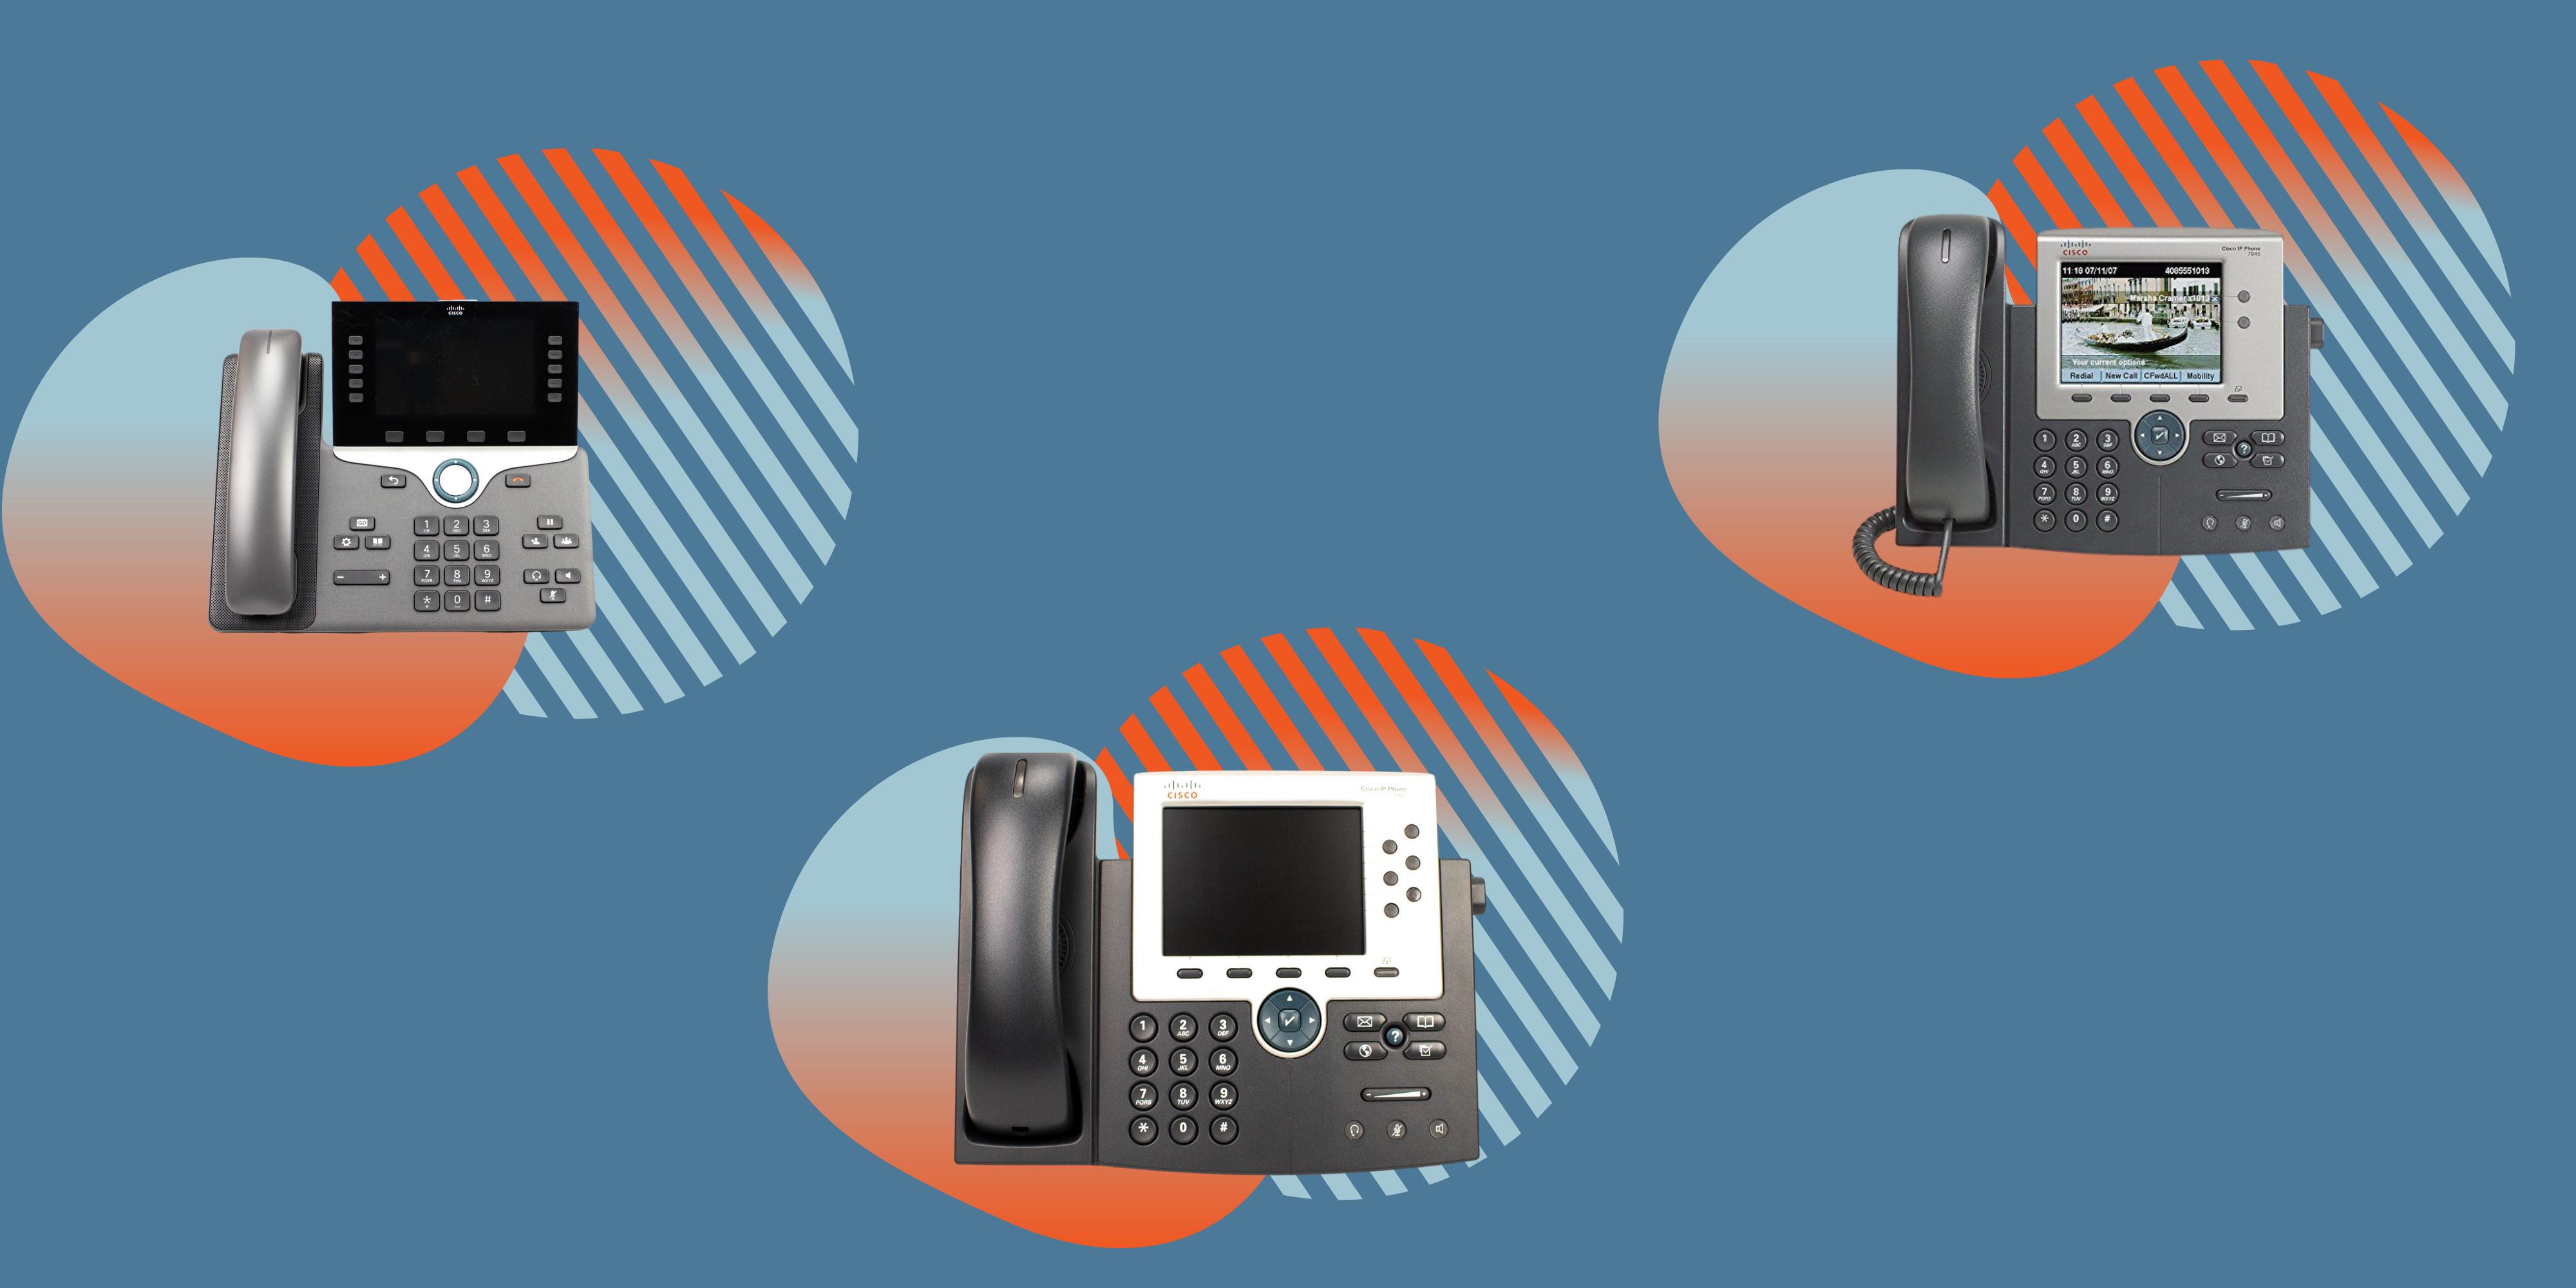 telephony equipment with pivit branding icons